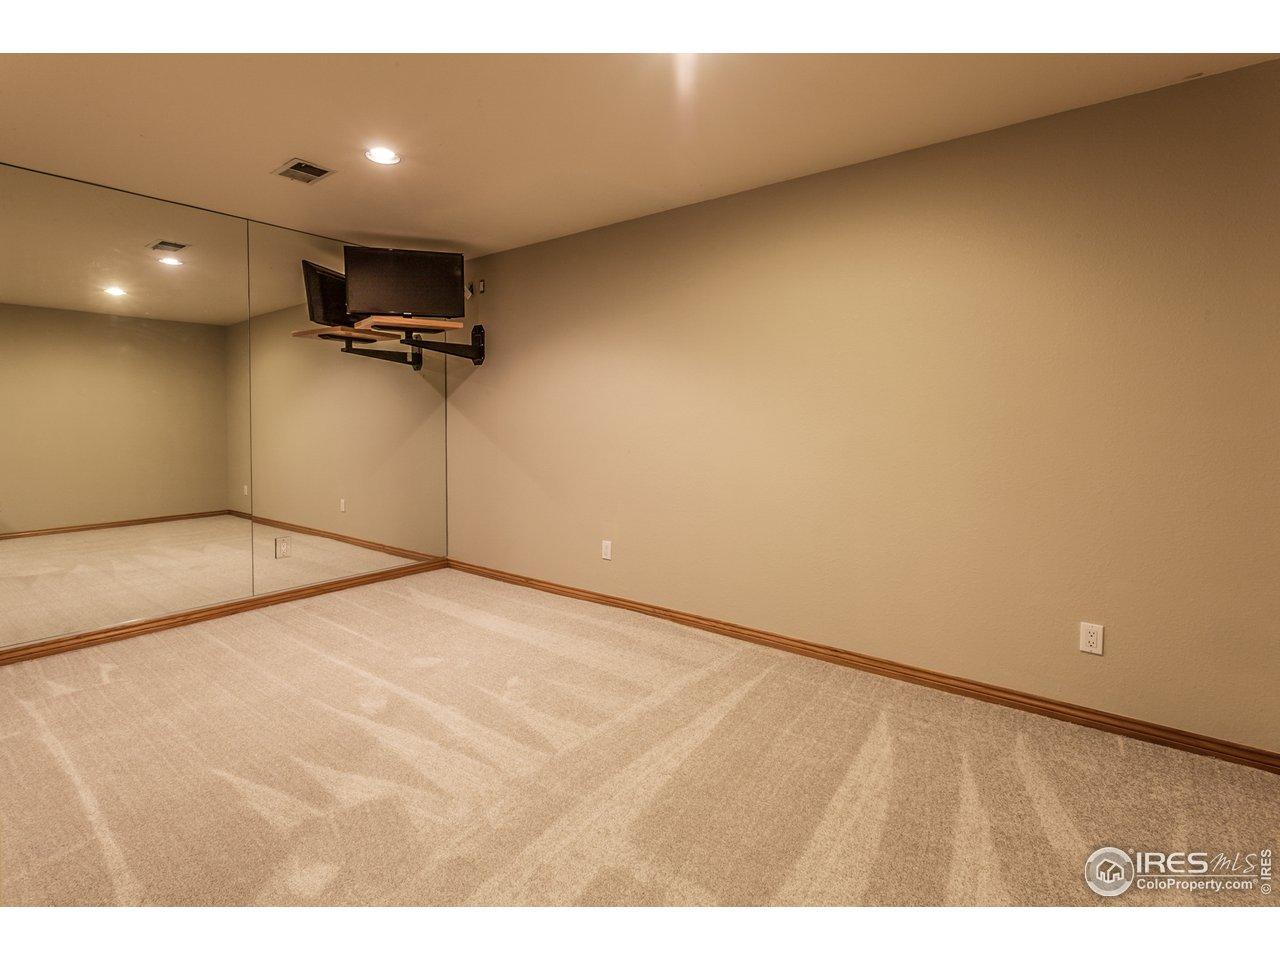 Workout room - basement